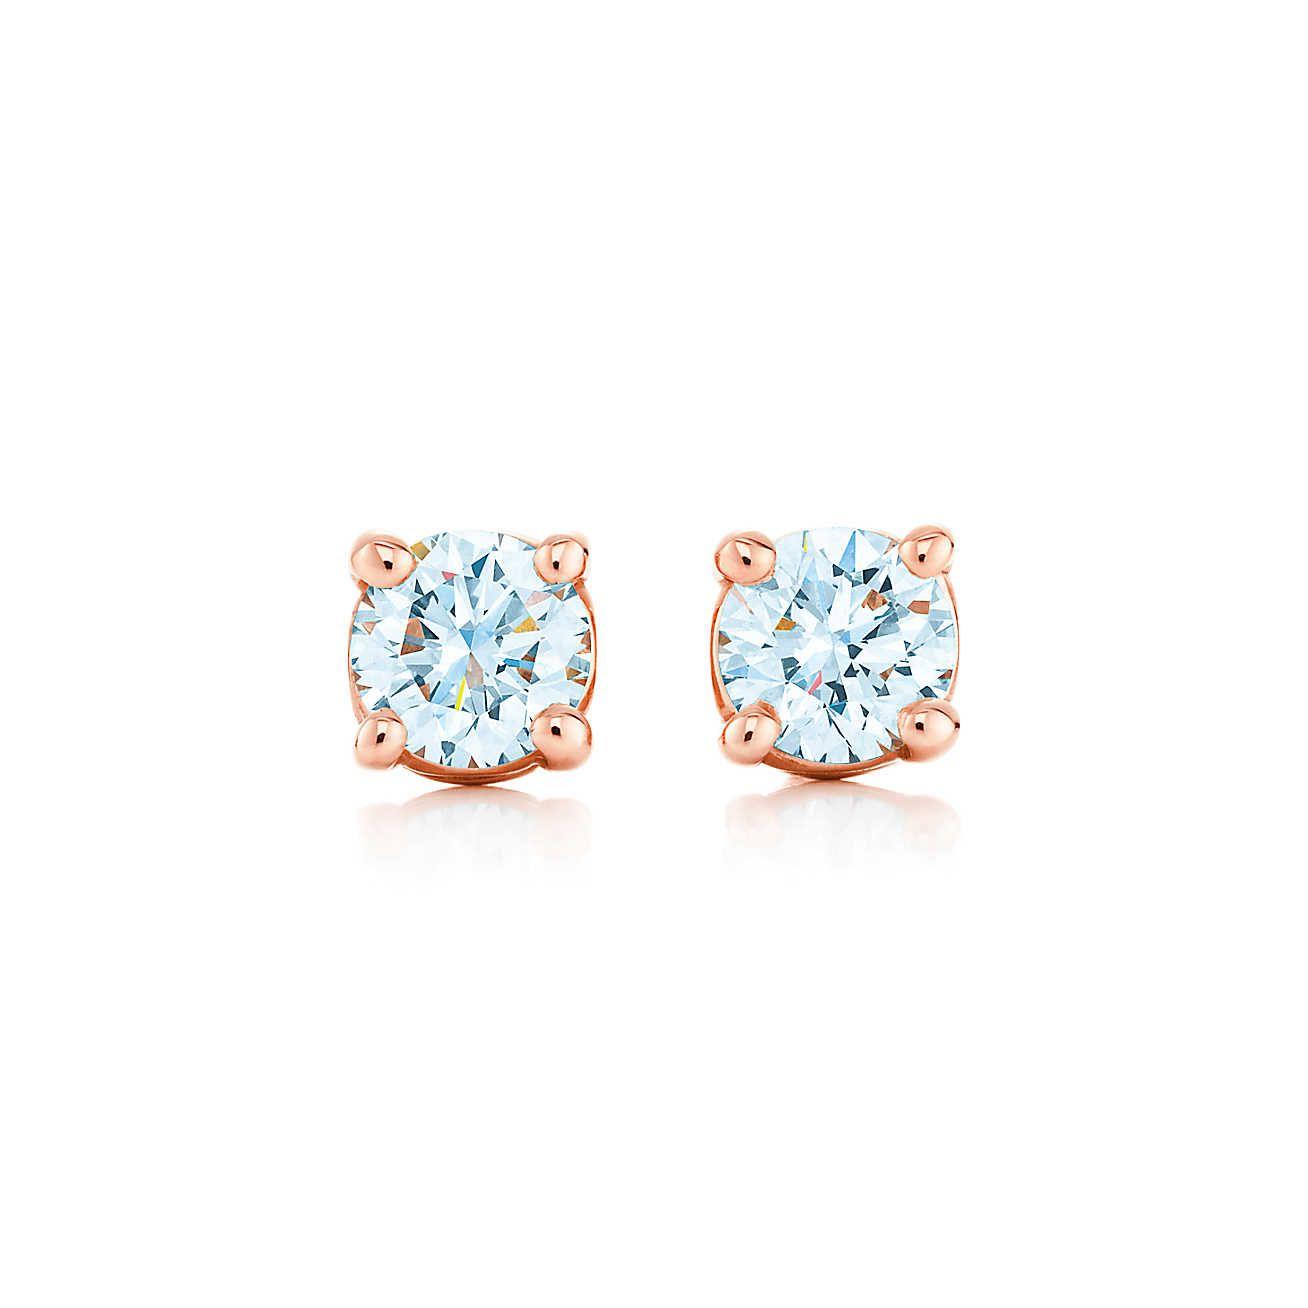 Tiffany & Co. – Wishlist